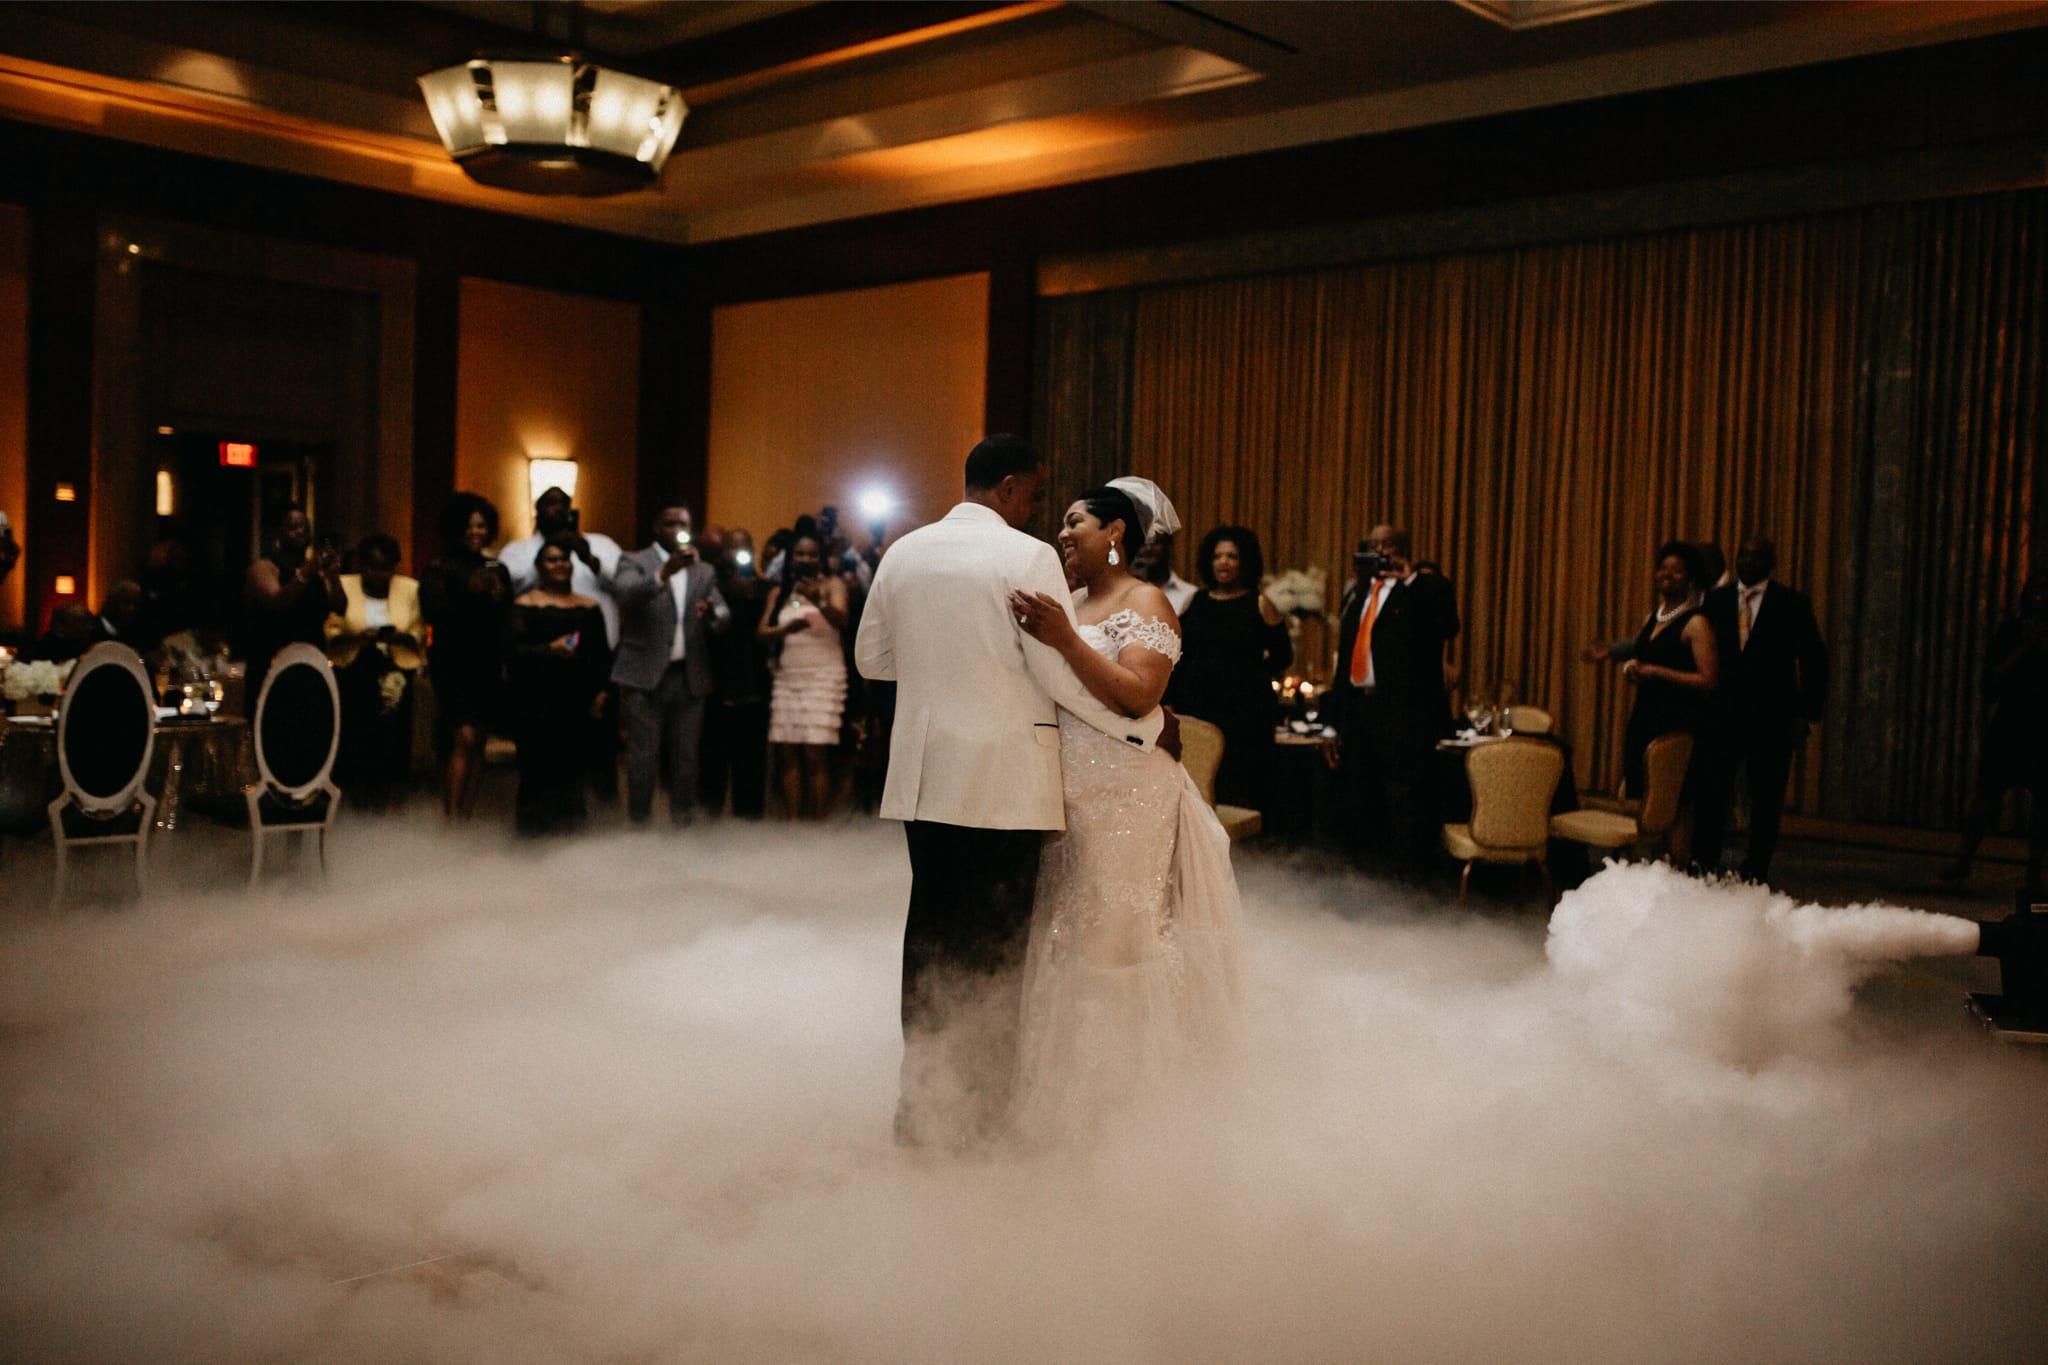 Ritz-Carlton-best-wedding-venue-charlotte-nc_6.jpg